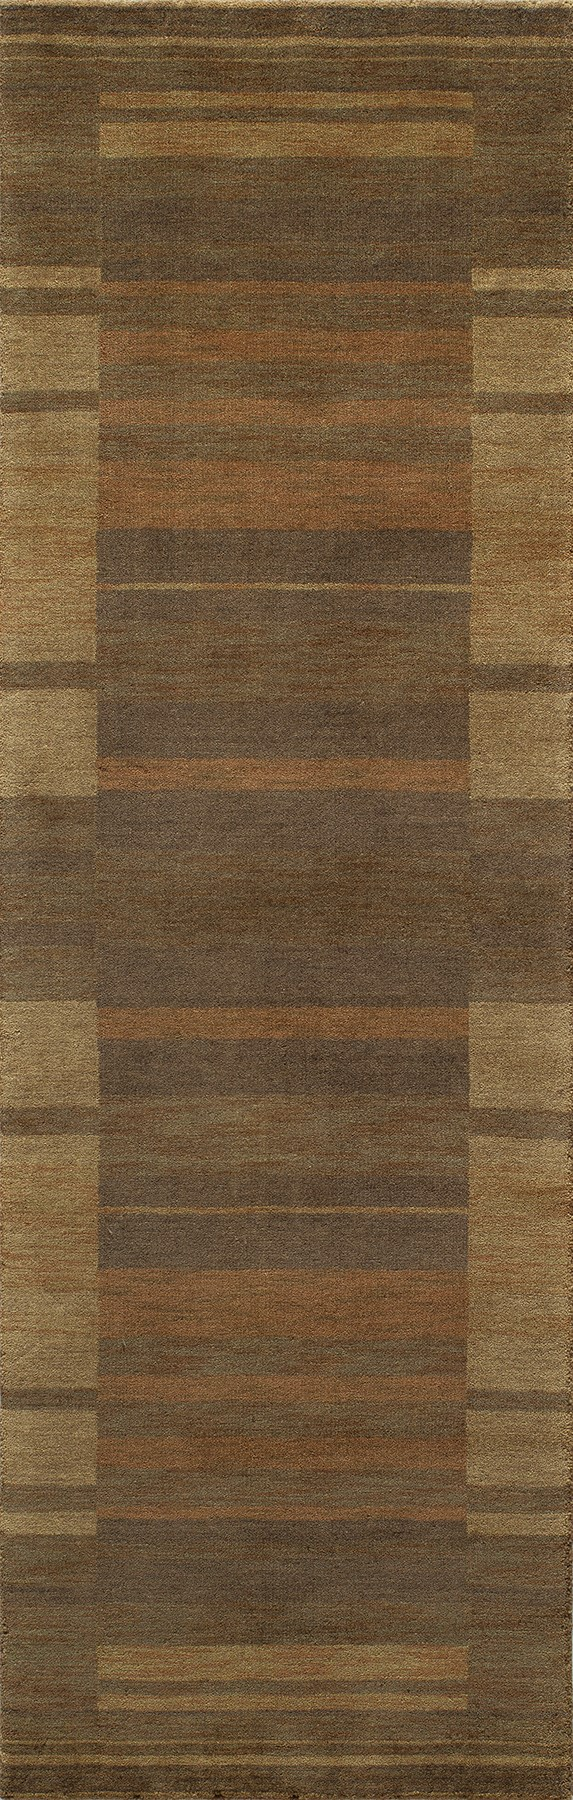 Brown Bordered Area Rug